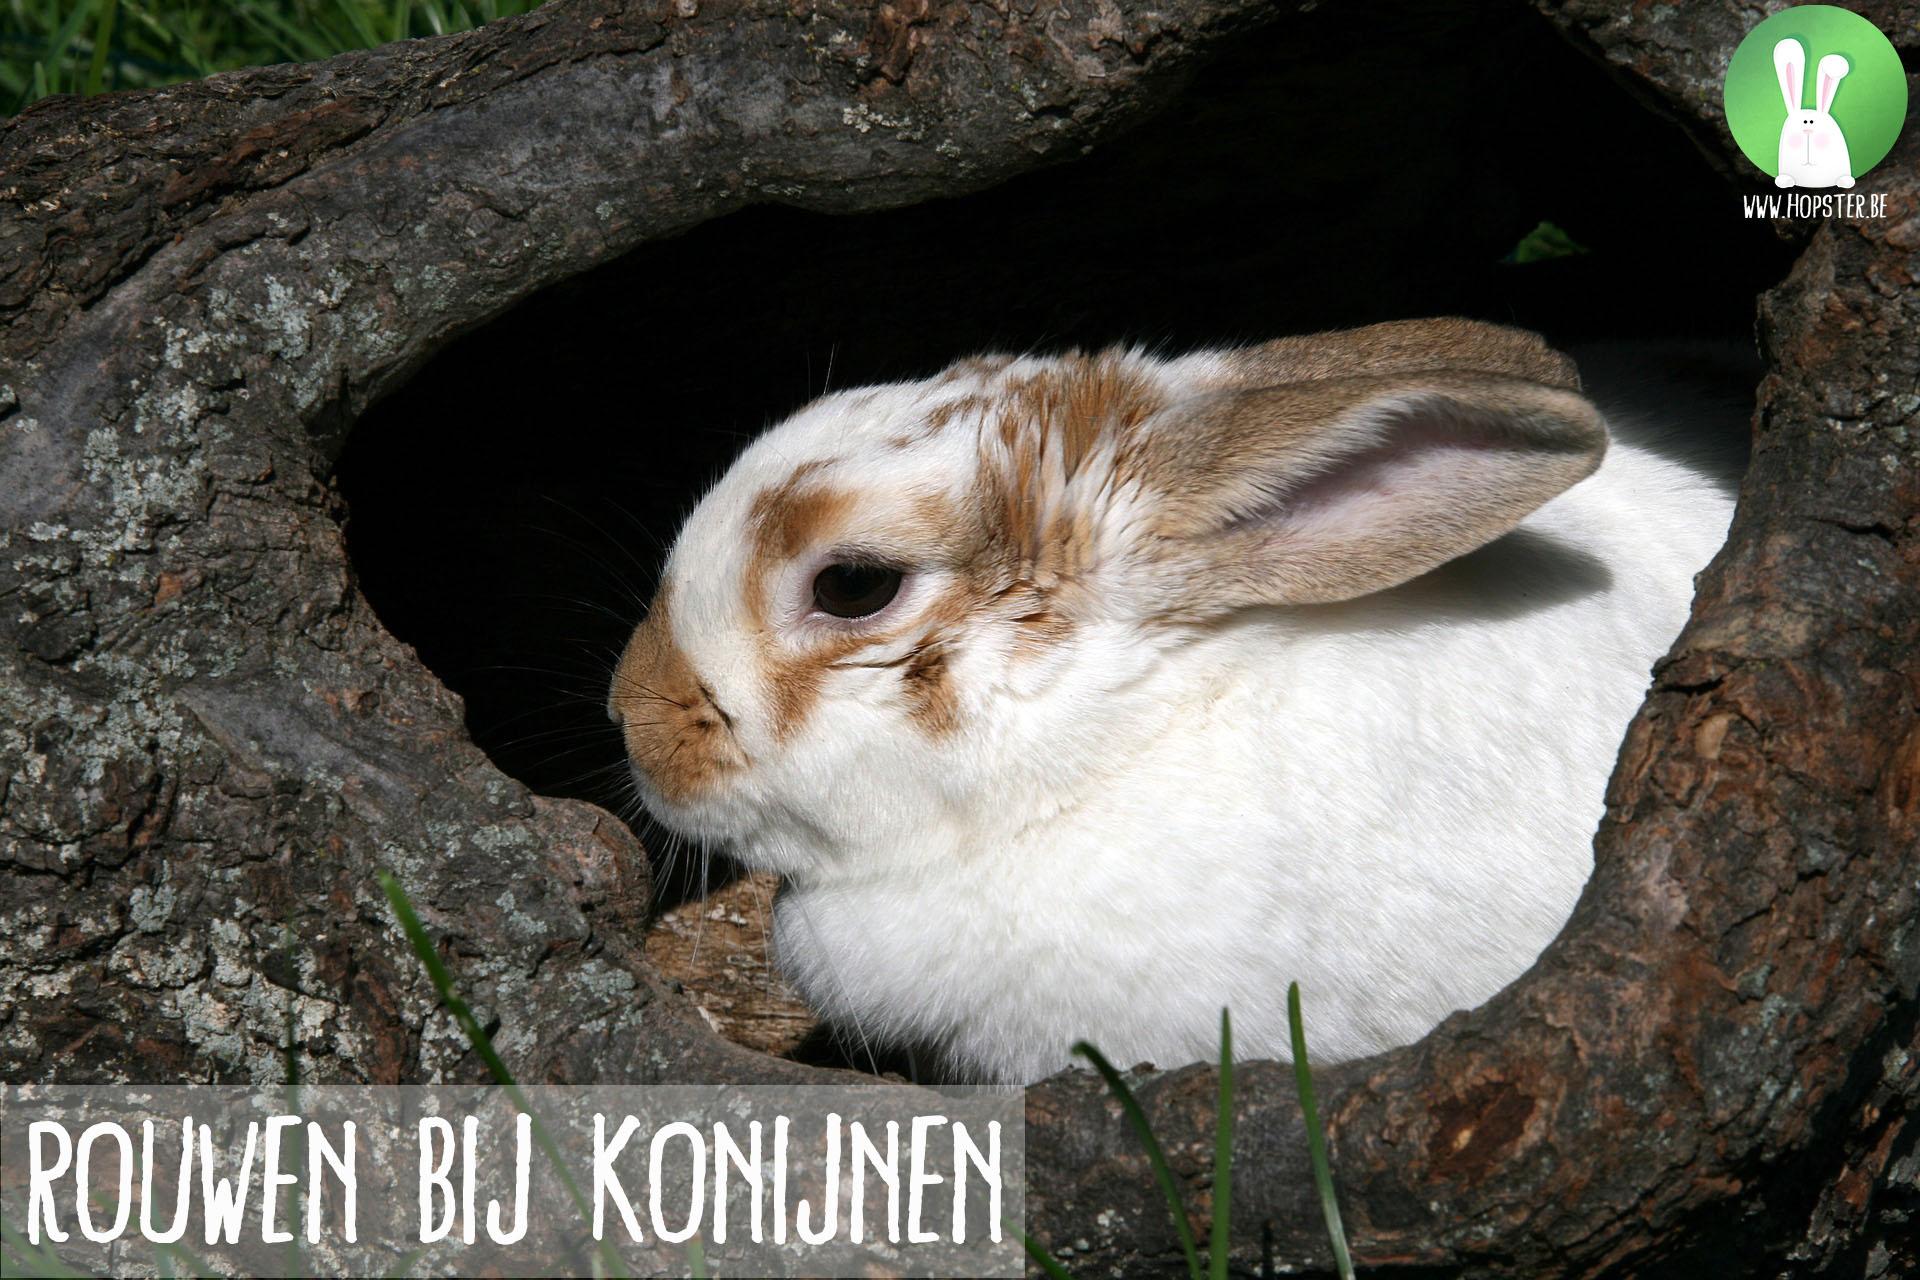 Rouwen bij konijnen | Konijnenadviesbureau Hopster